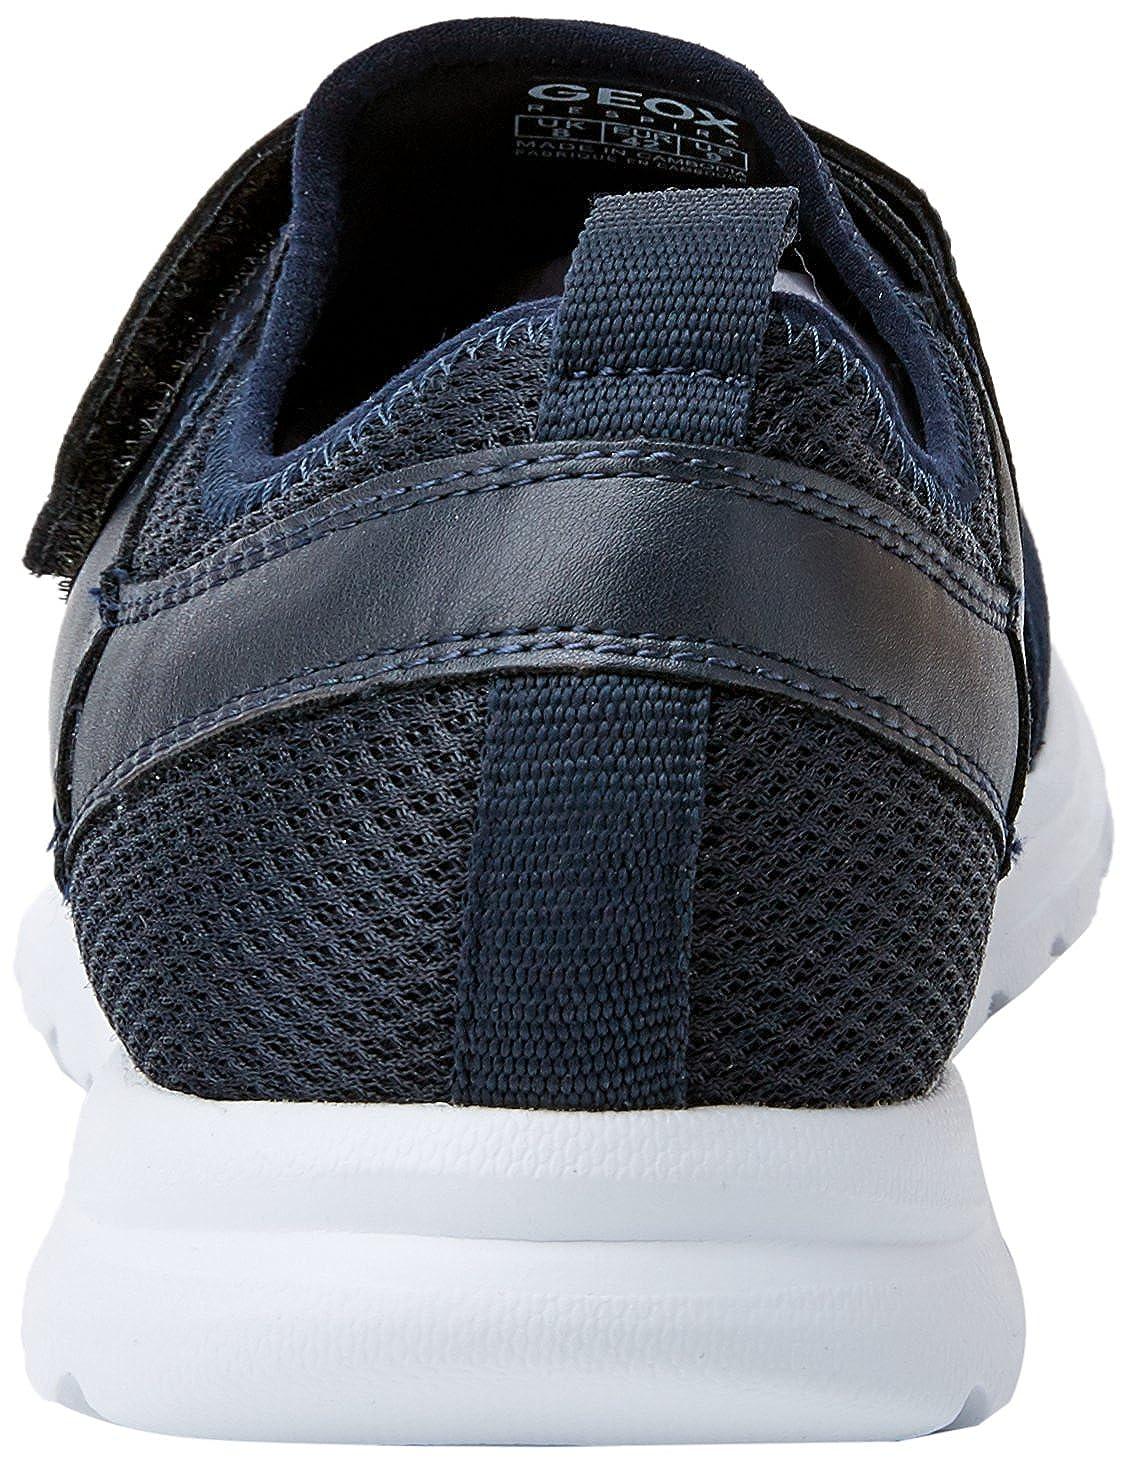 Shoes & Bags Geox Mens U Damian B Trainers U820HB